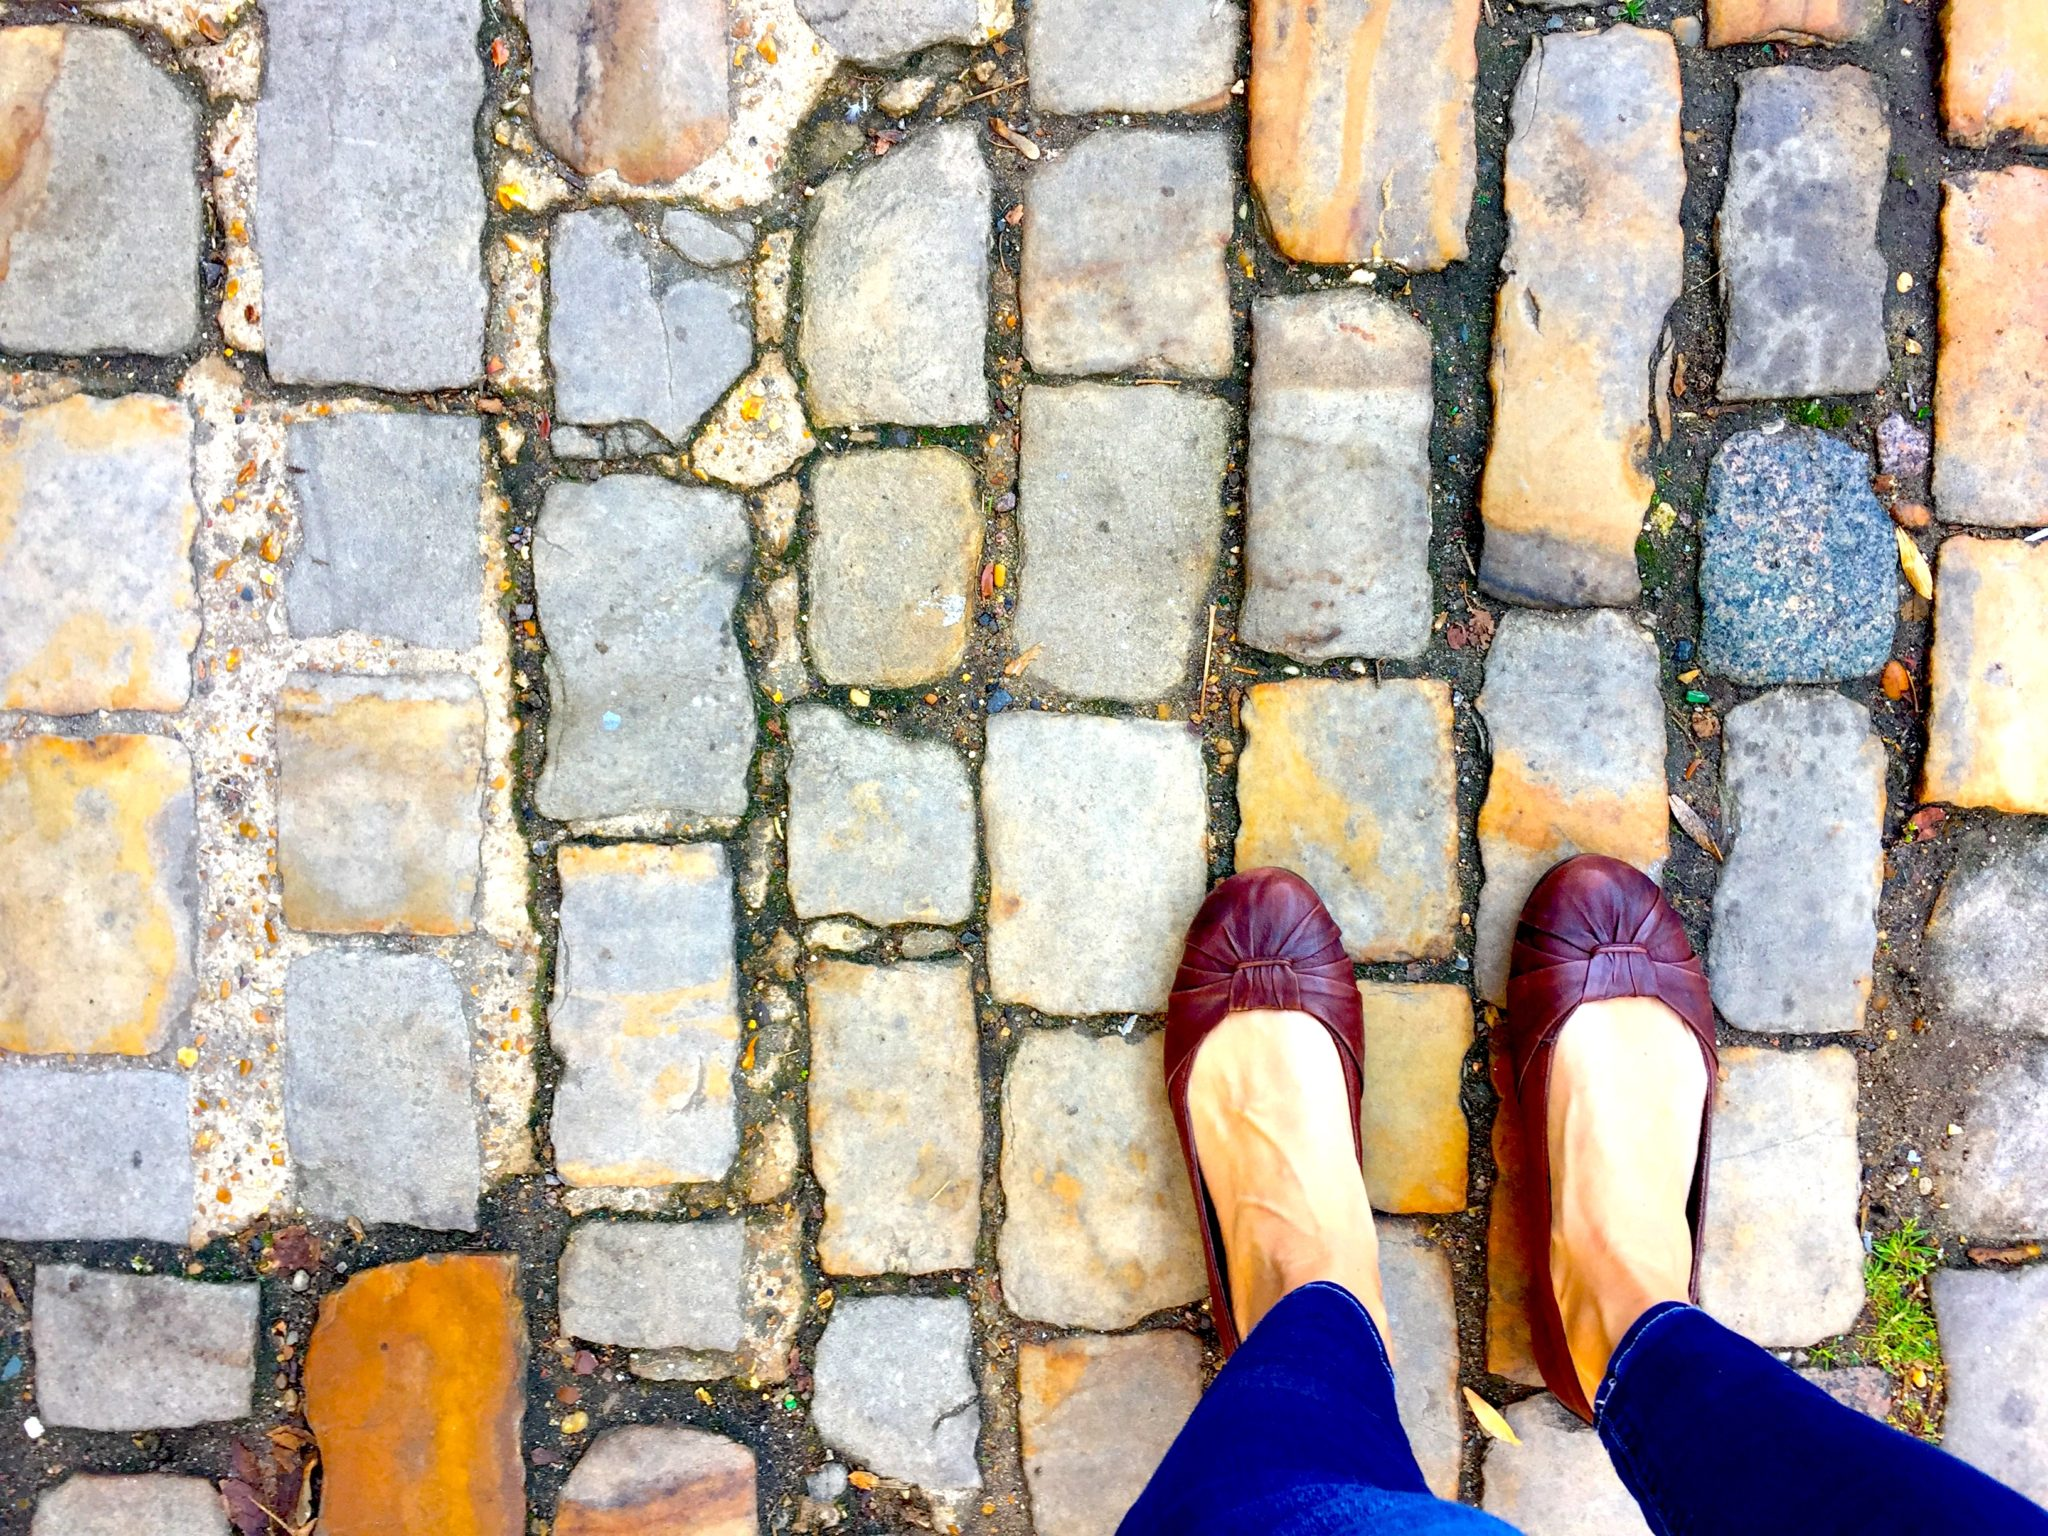 Cobblestones \u0026 69 Shoes: Which wore